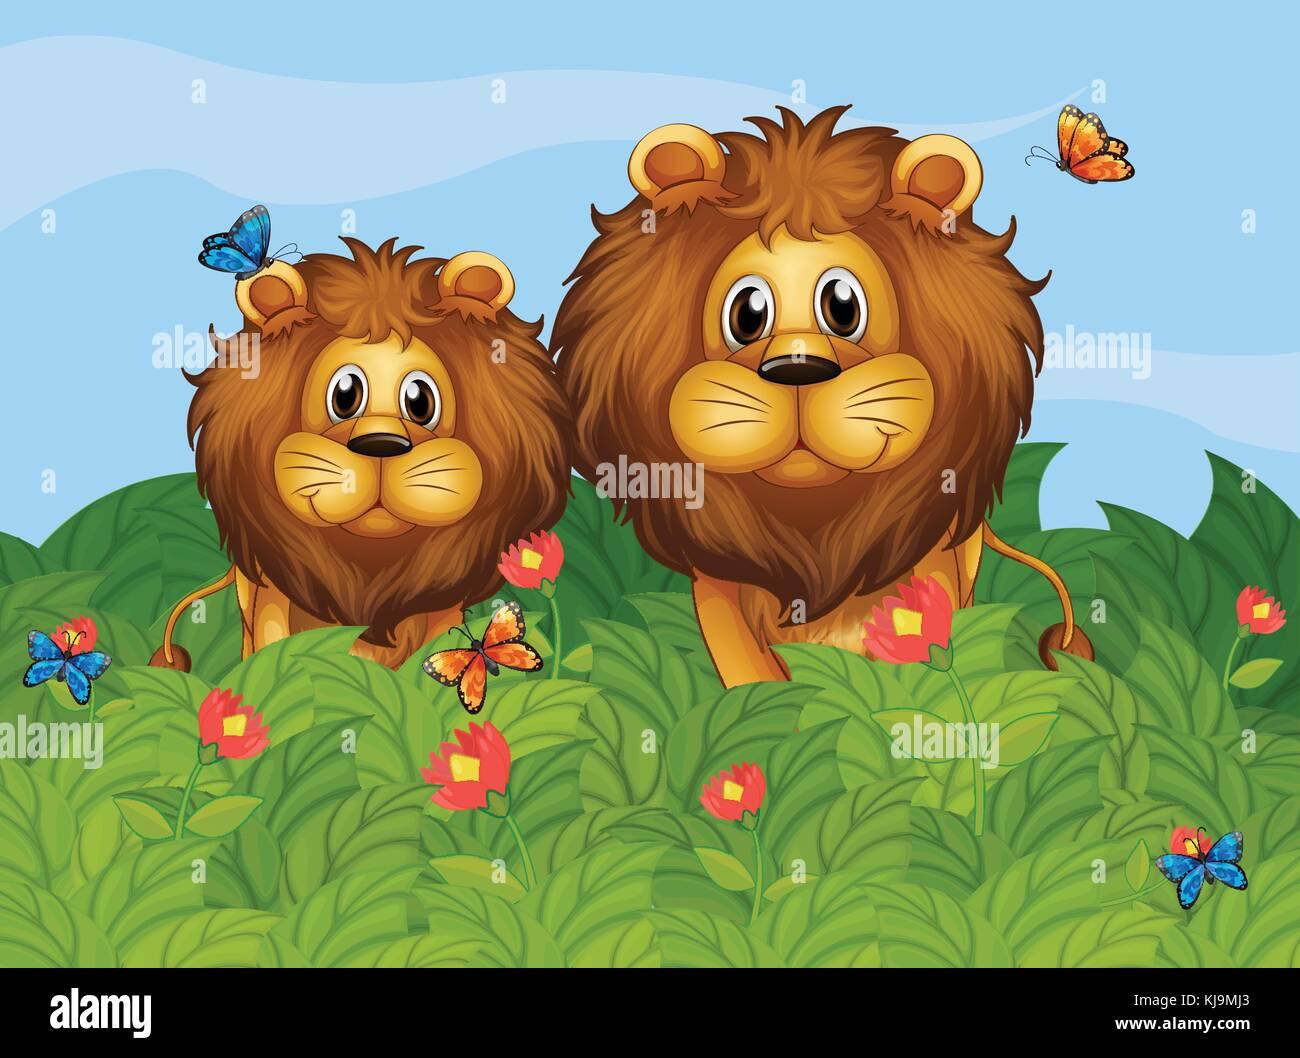 Lion Wings Stockfotos & Lion Wings Bilder - Seite 3 - Alamy